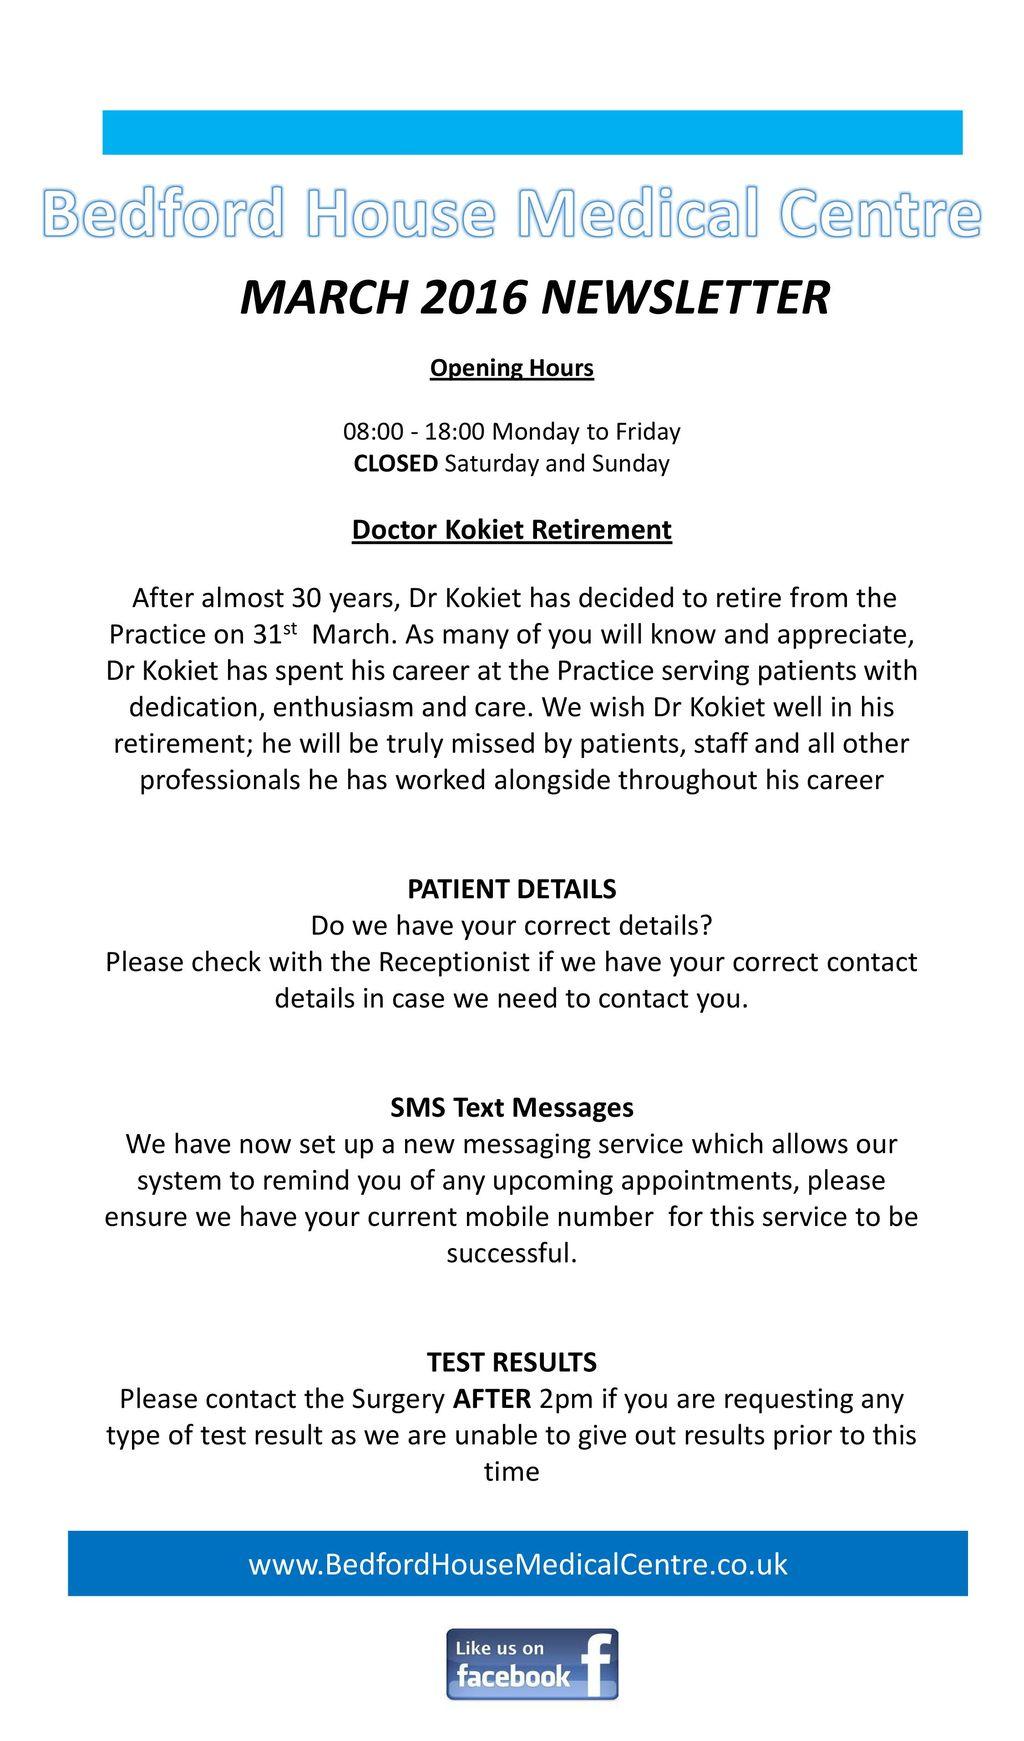 bedford house medical centre doctor kokiet retirement ppt download